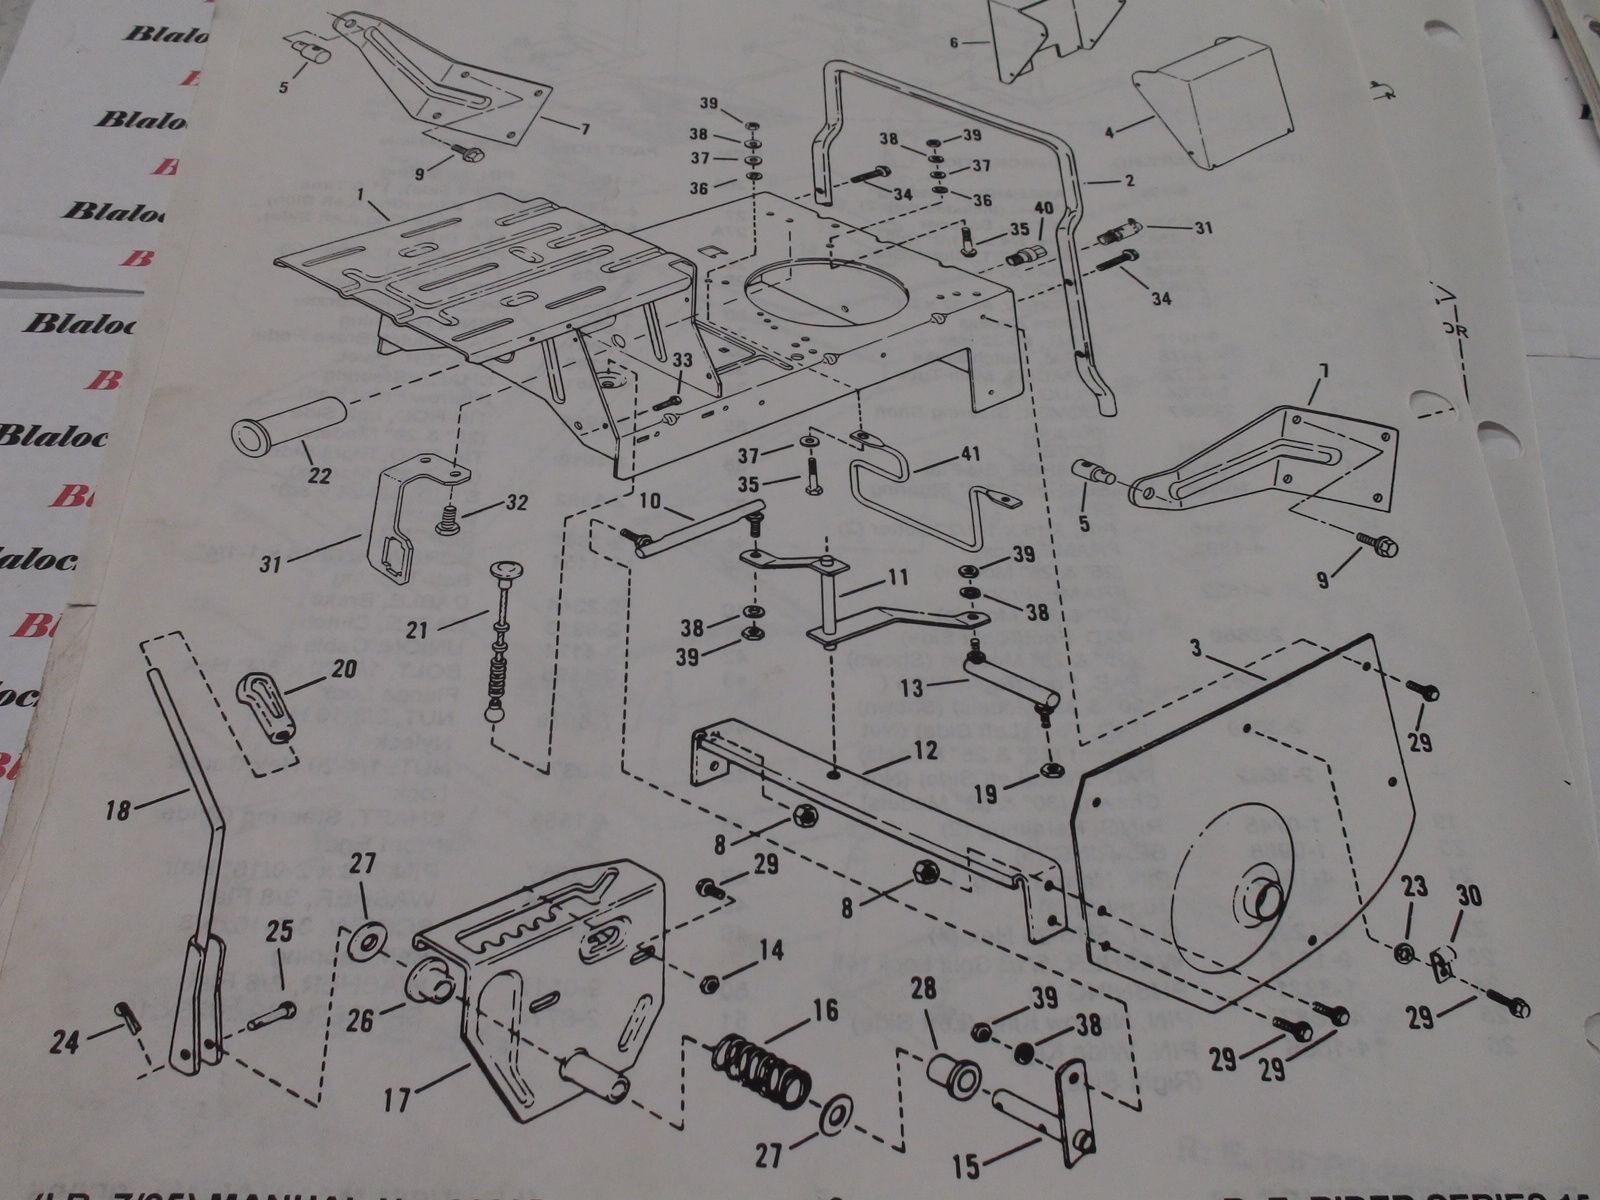 Honda Gx240 Parts Diagram Snapper Series 15 Rear Engine Rider Parts Manual Of Honda Gx240 Parts Diagram Snapper Series 15 Rear Engine Rider Parts Manual